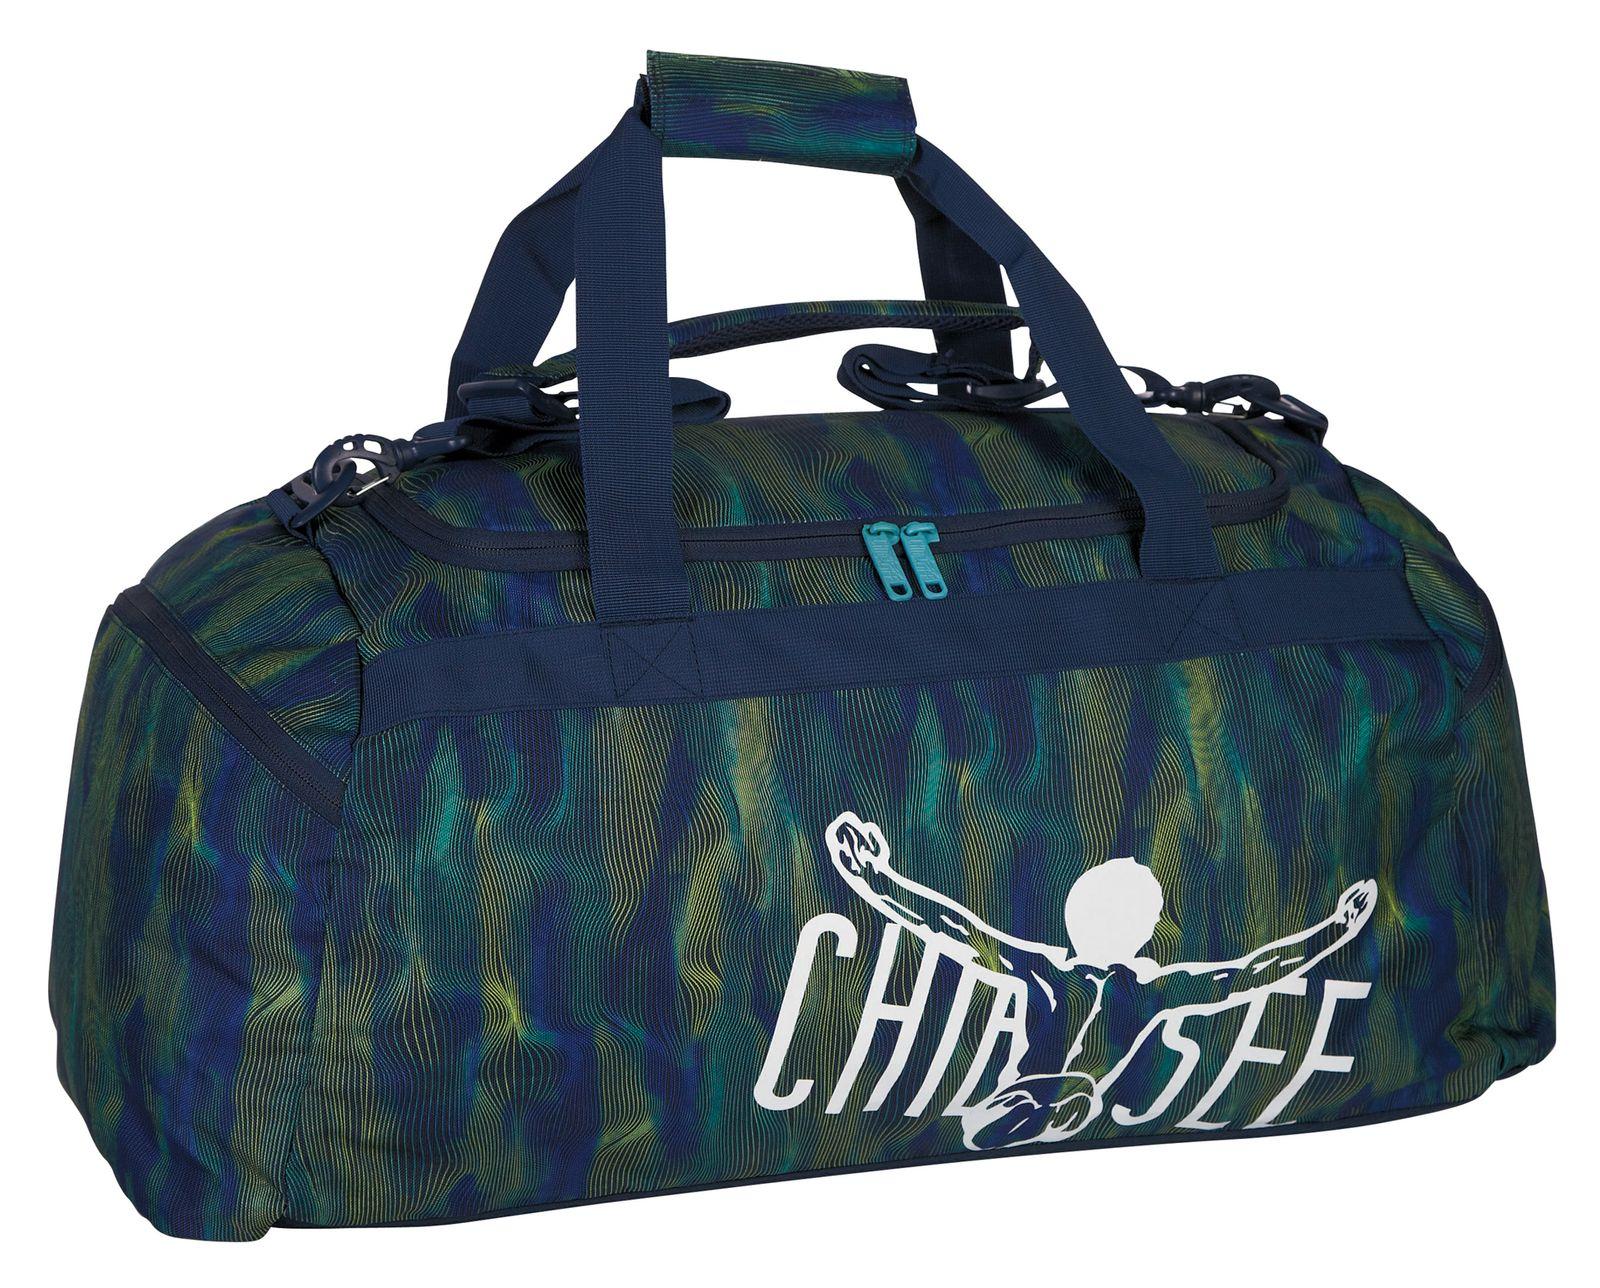 4225cf4bf7d2b CHIEMSEE Matchbag Large Line Dance Blue